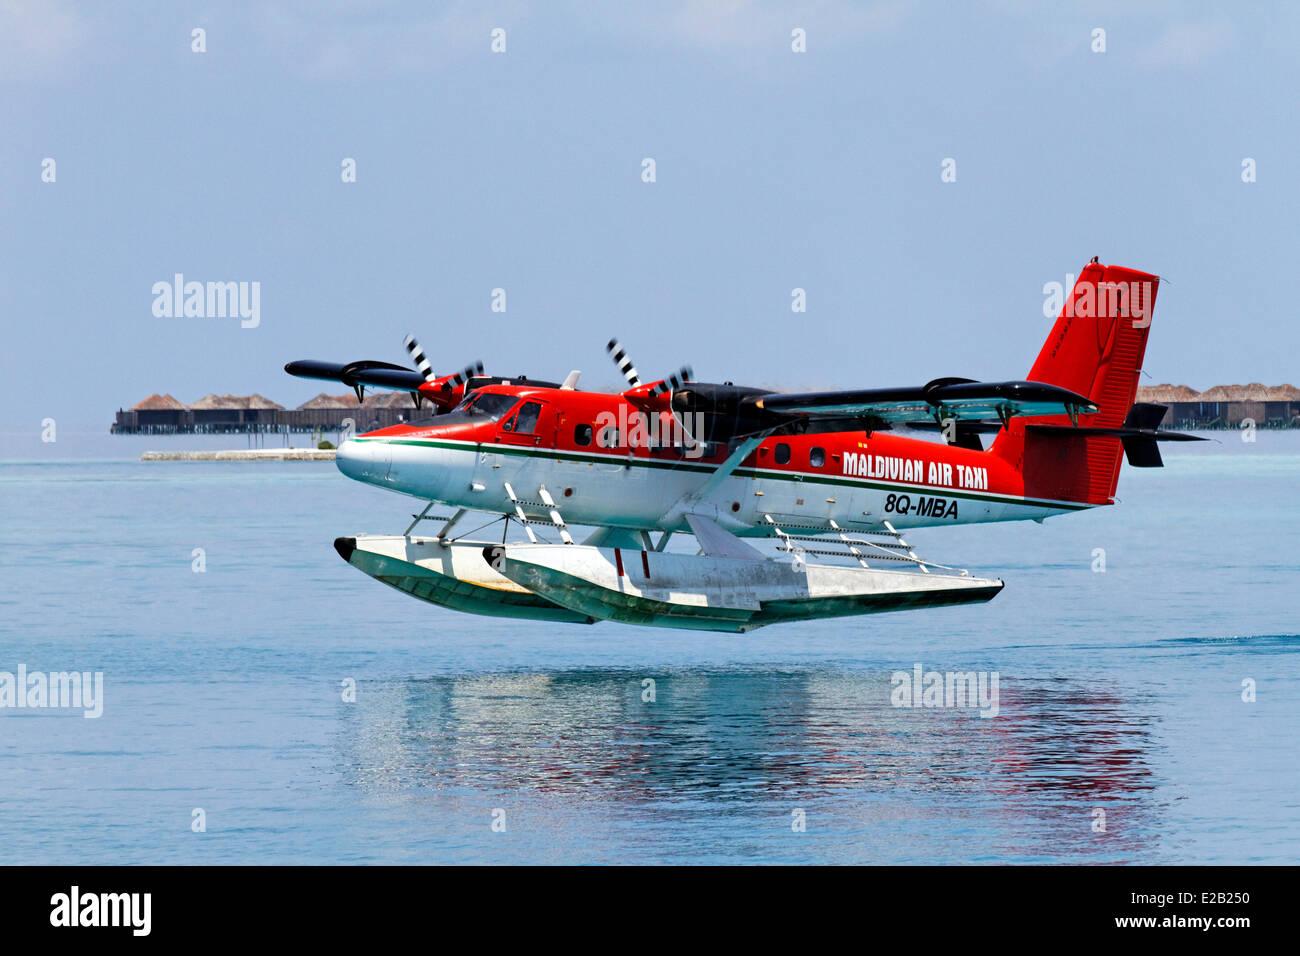 Maldives, seaplane of Maldivian Air Taxi company, planing - Stock Image